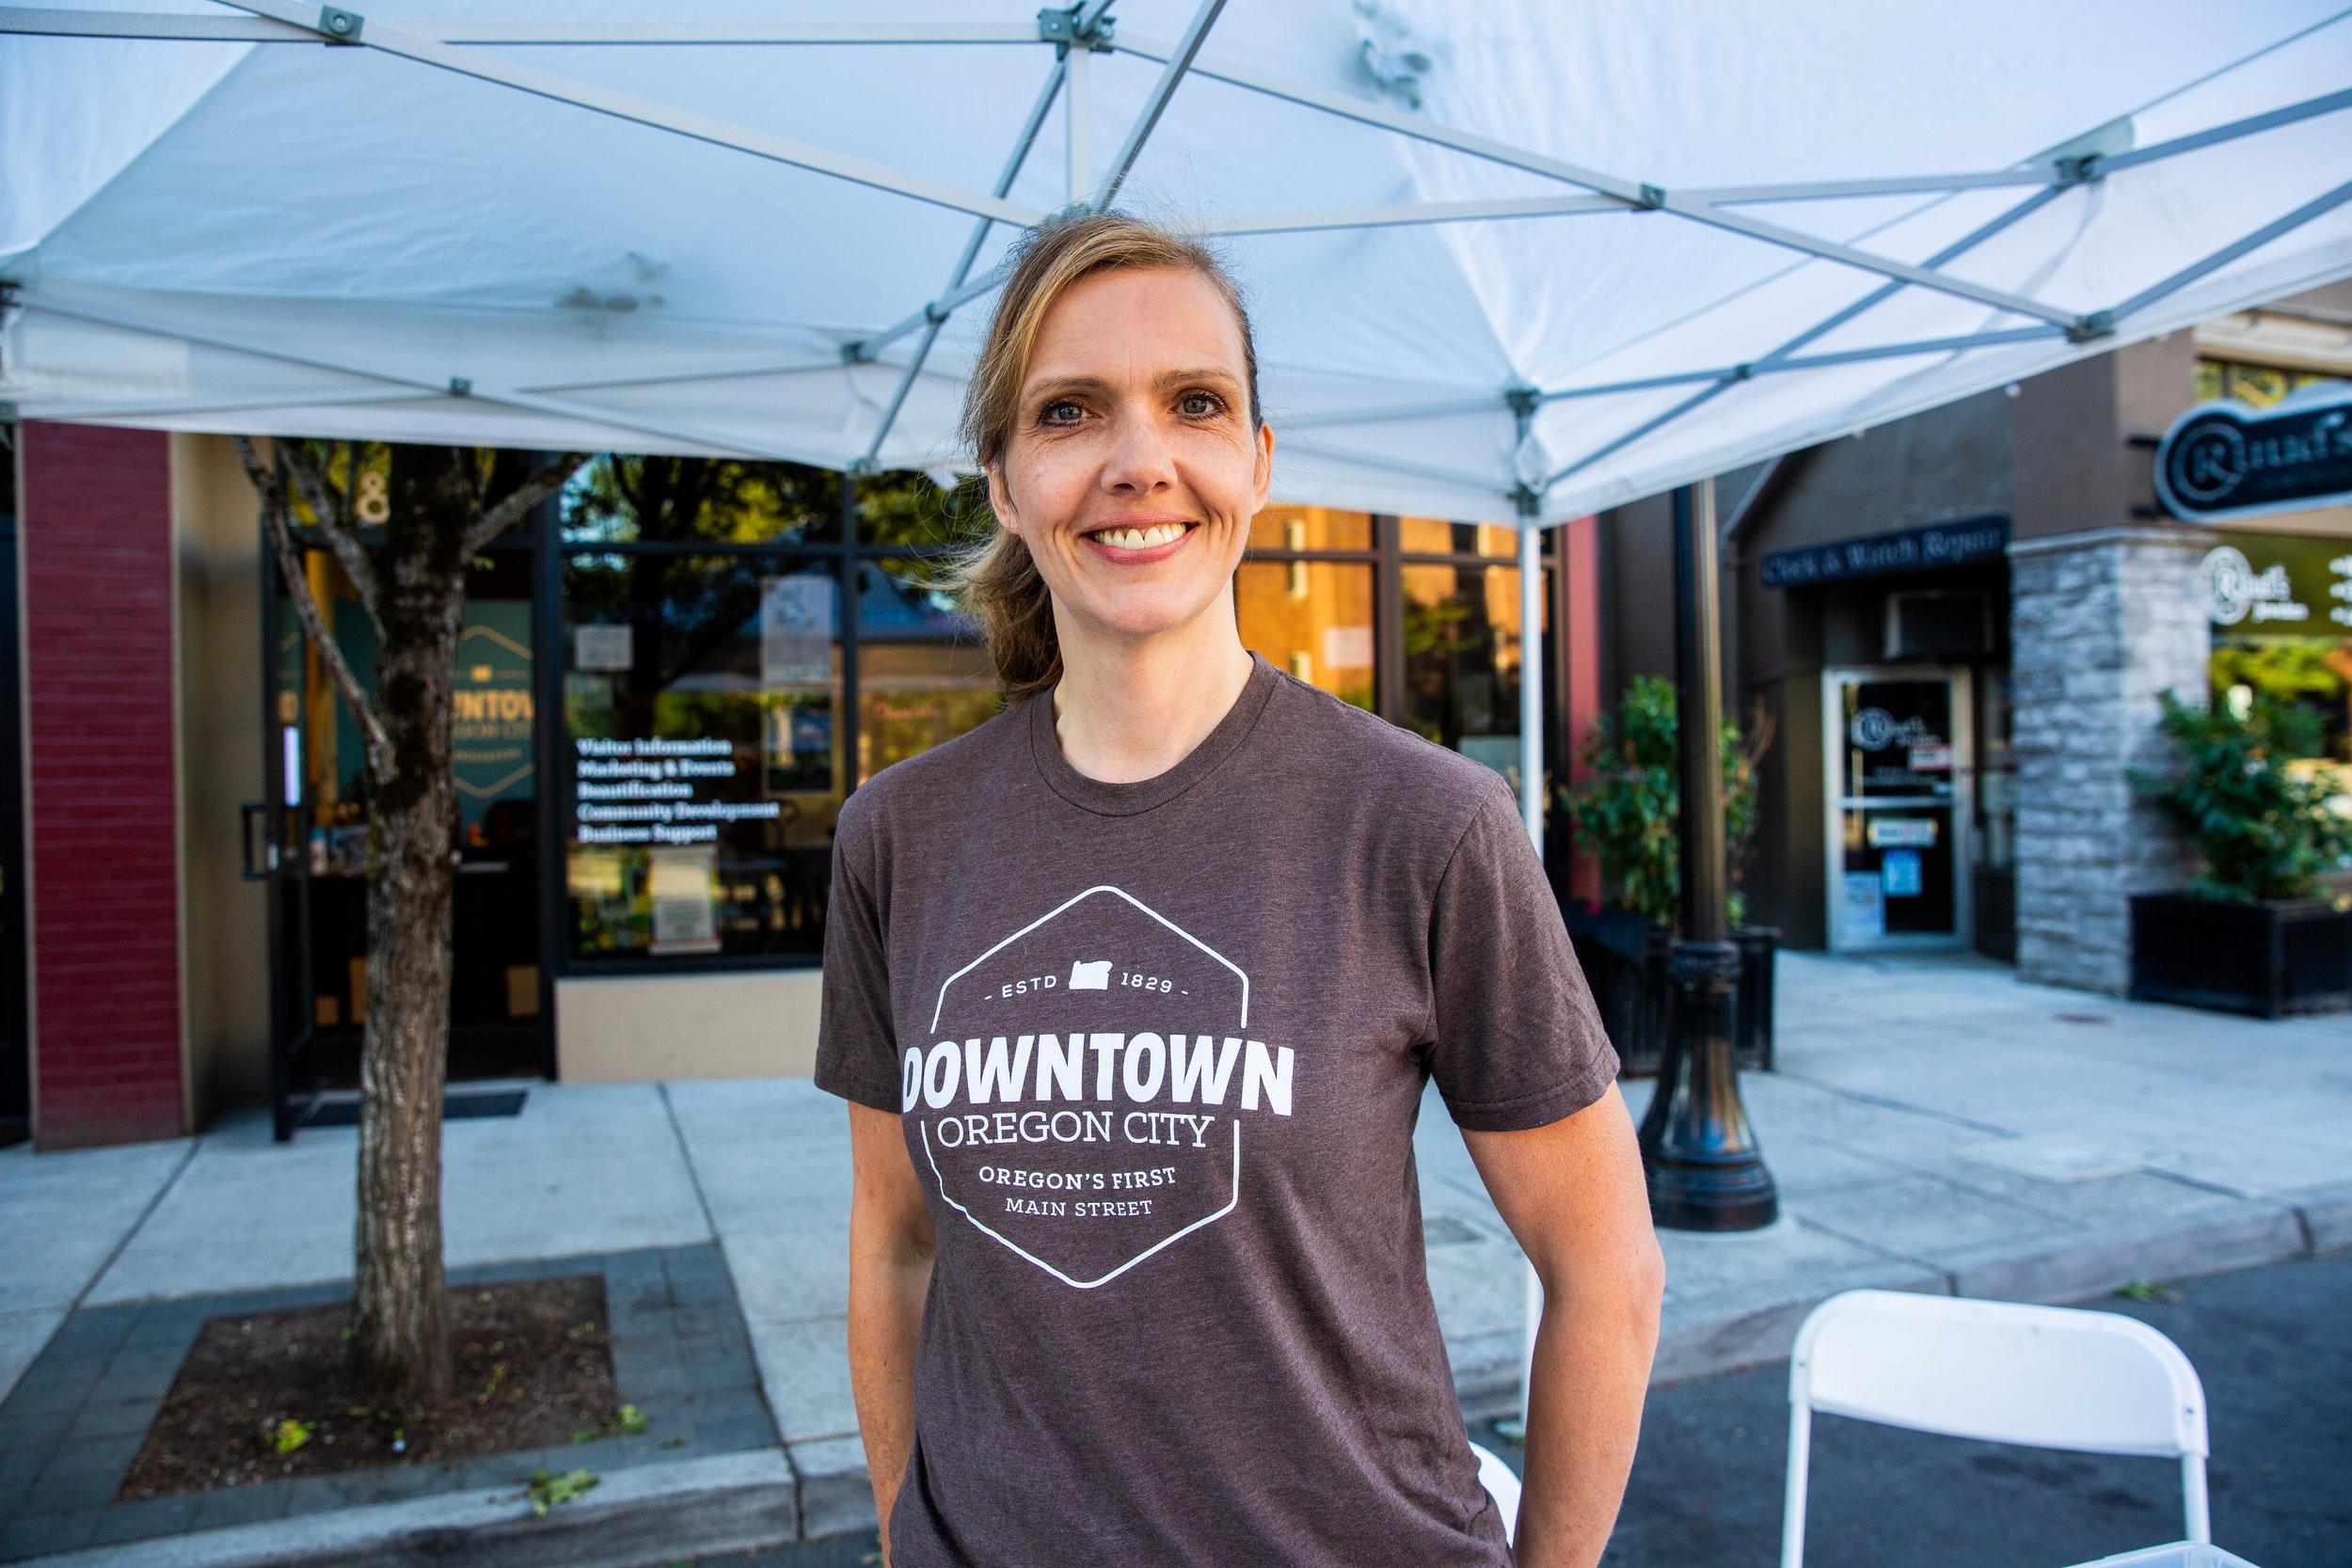 080518-Downtown-Oregon-City-5K-Run-Final-Selects-HR-1.jpg